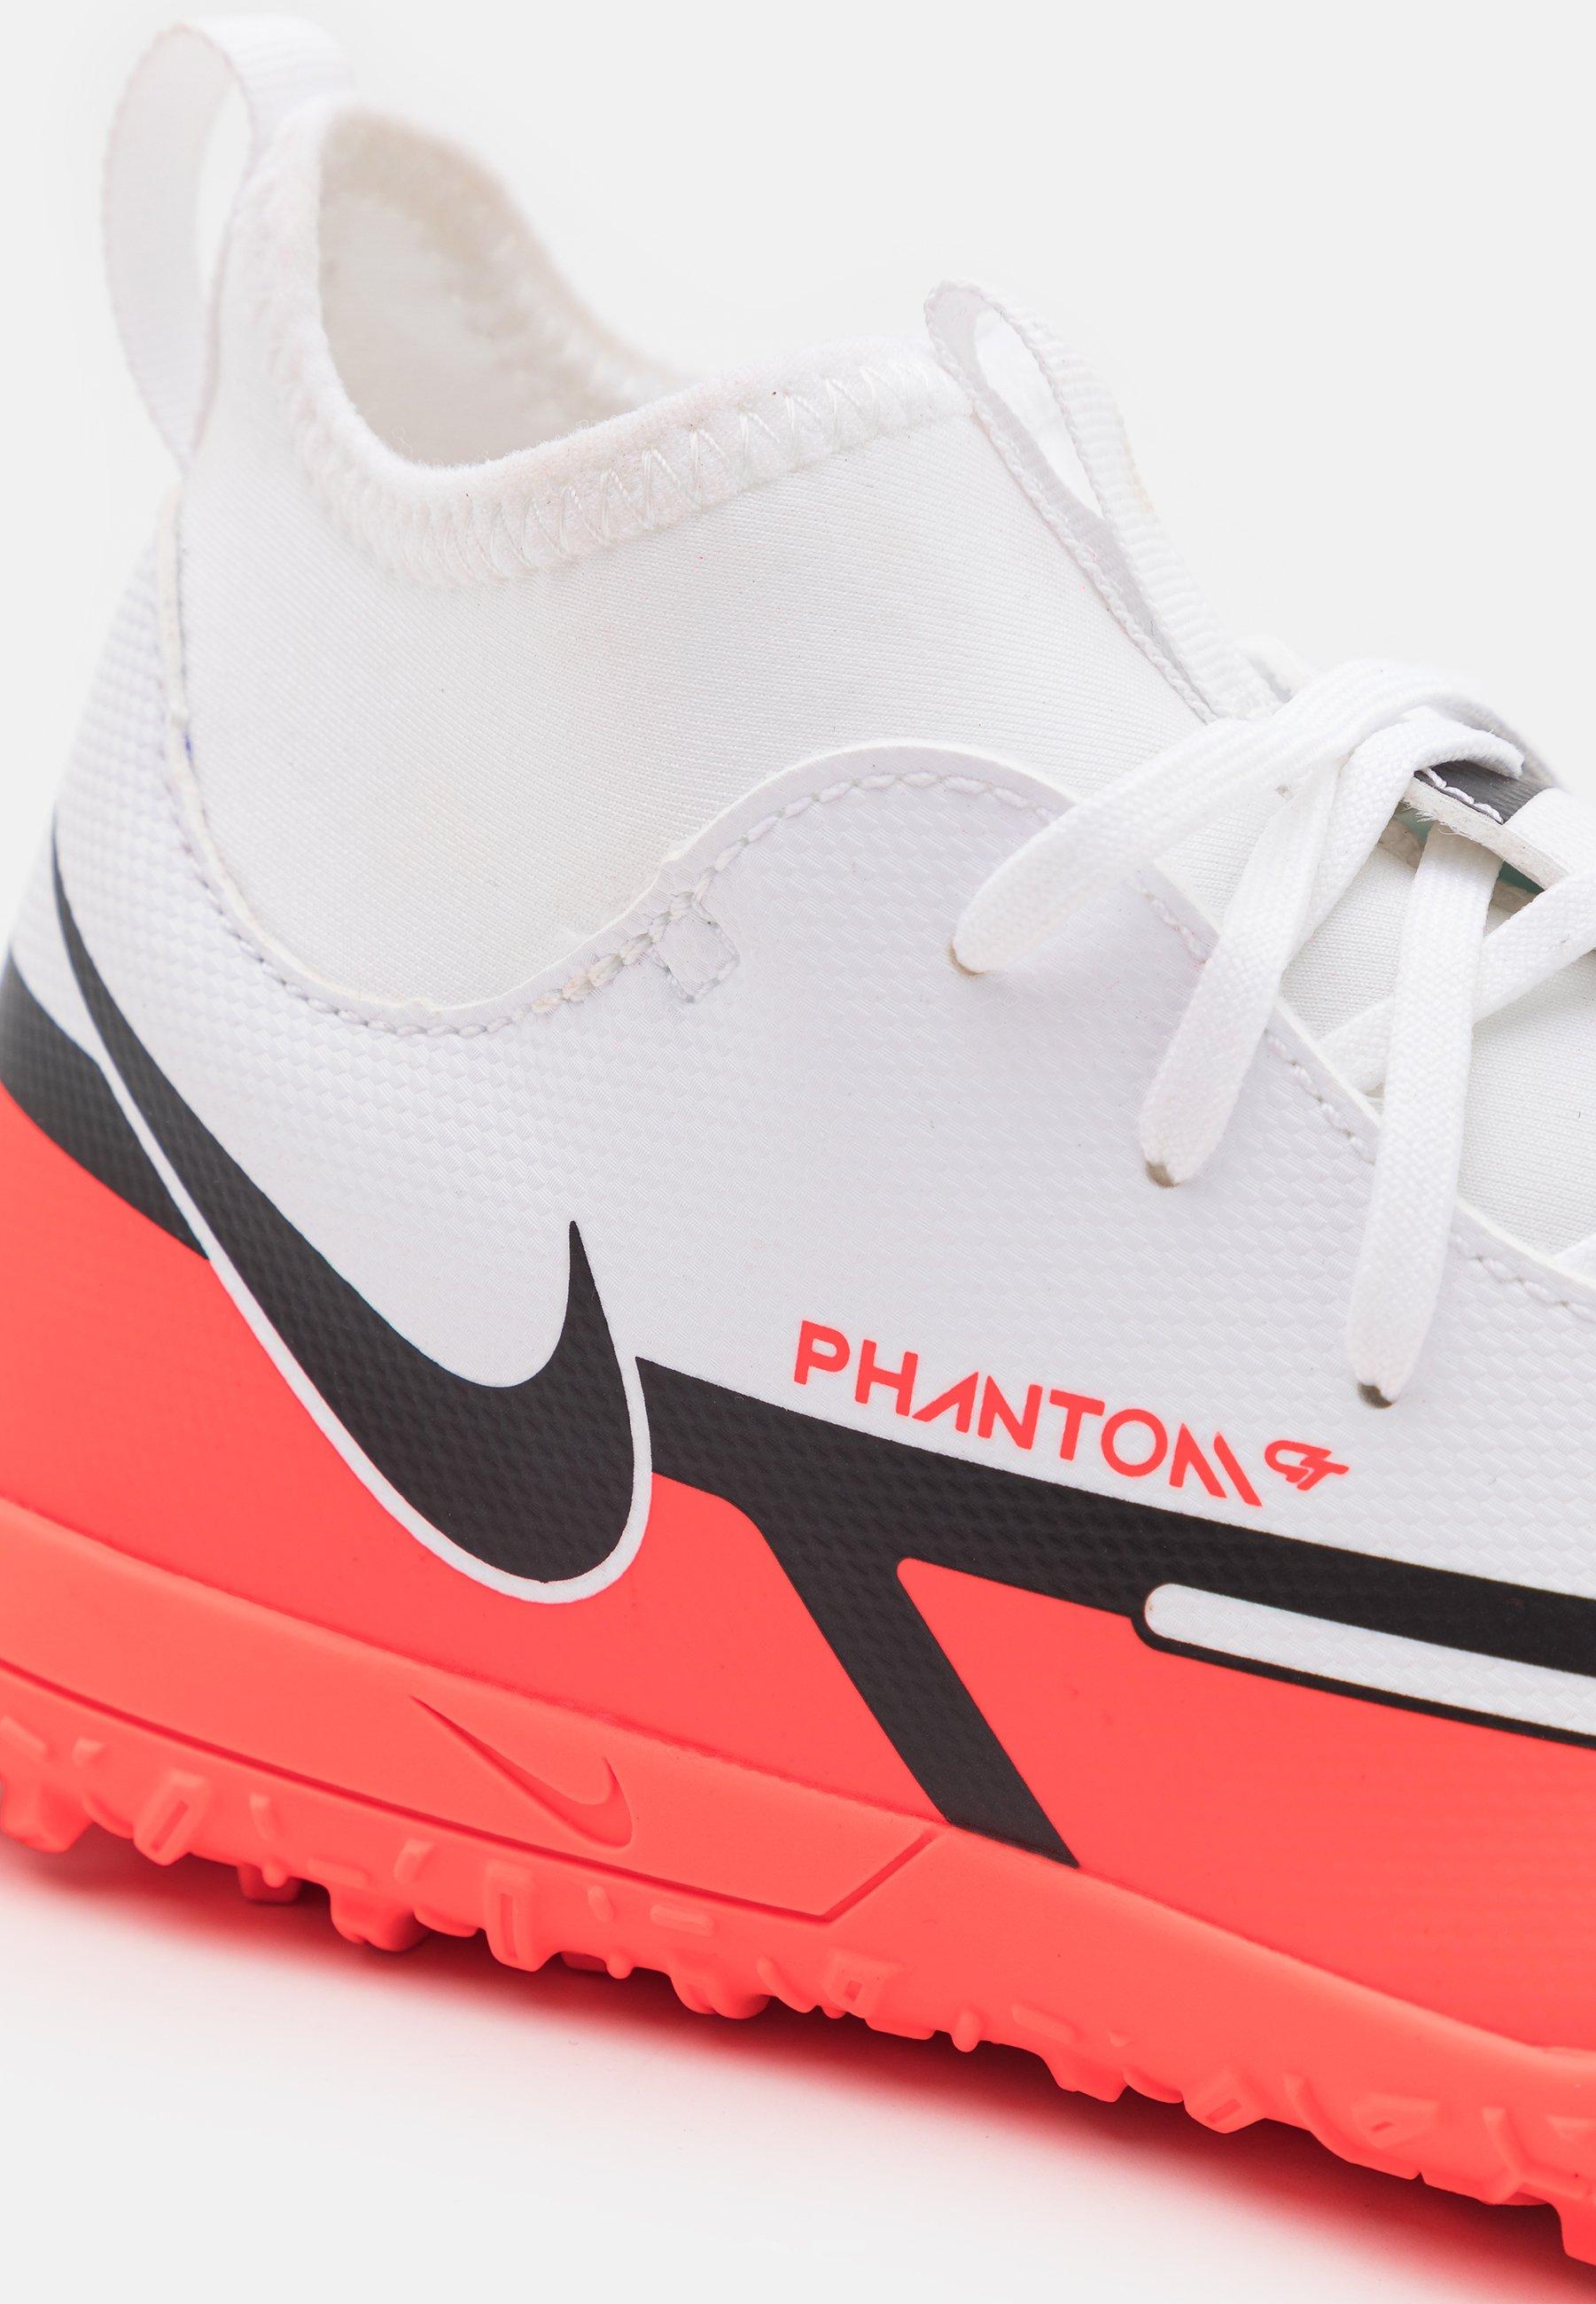 Kids JR. PHANTOM GT2 CLUB DYNAMIC FIT TF UNISEX - Astro turf trainers